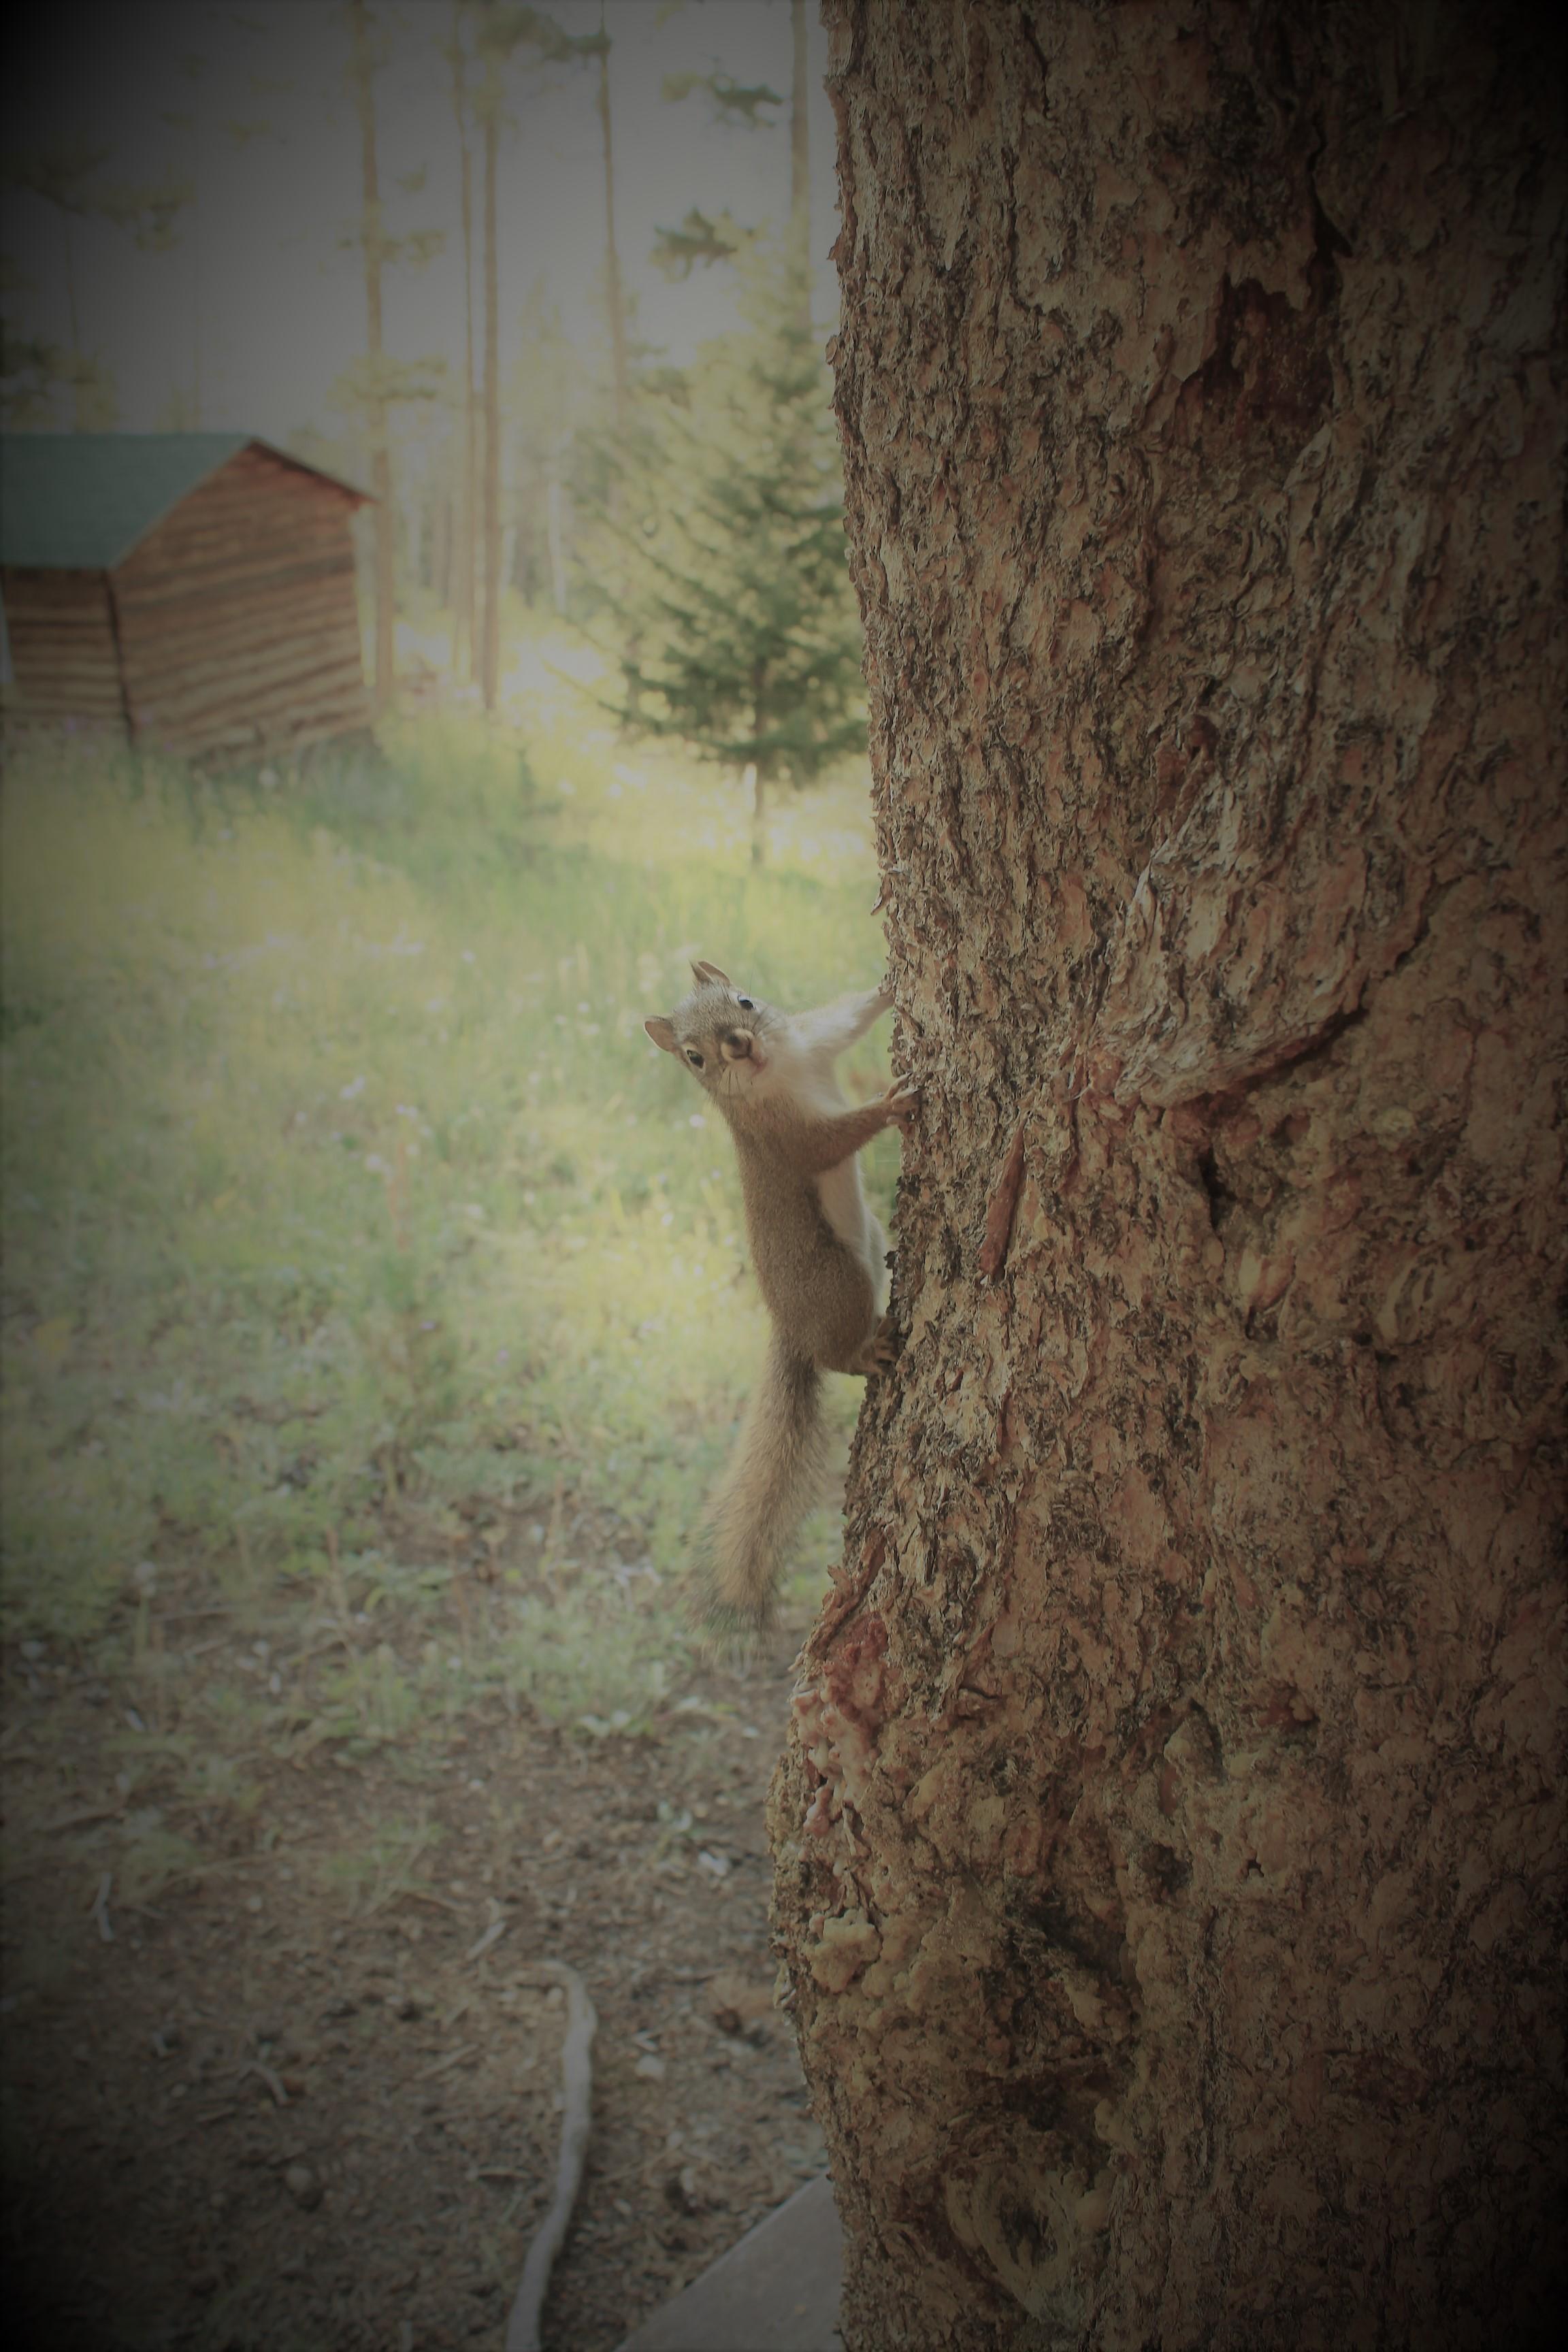 squirrel on tree.JPG